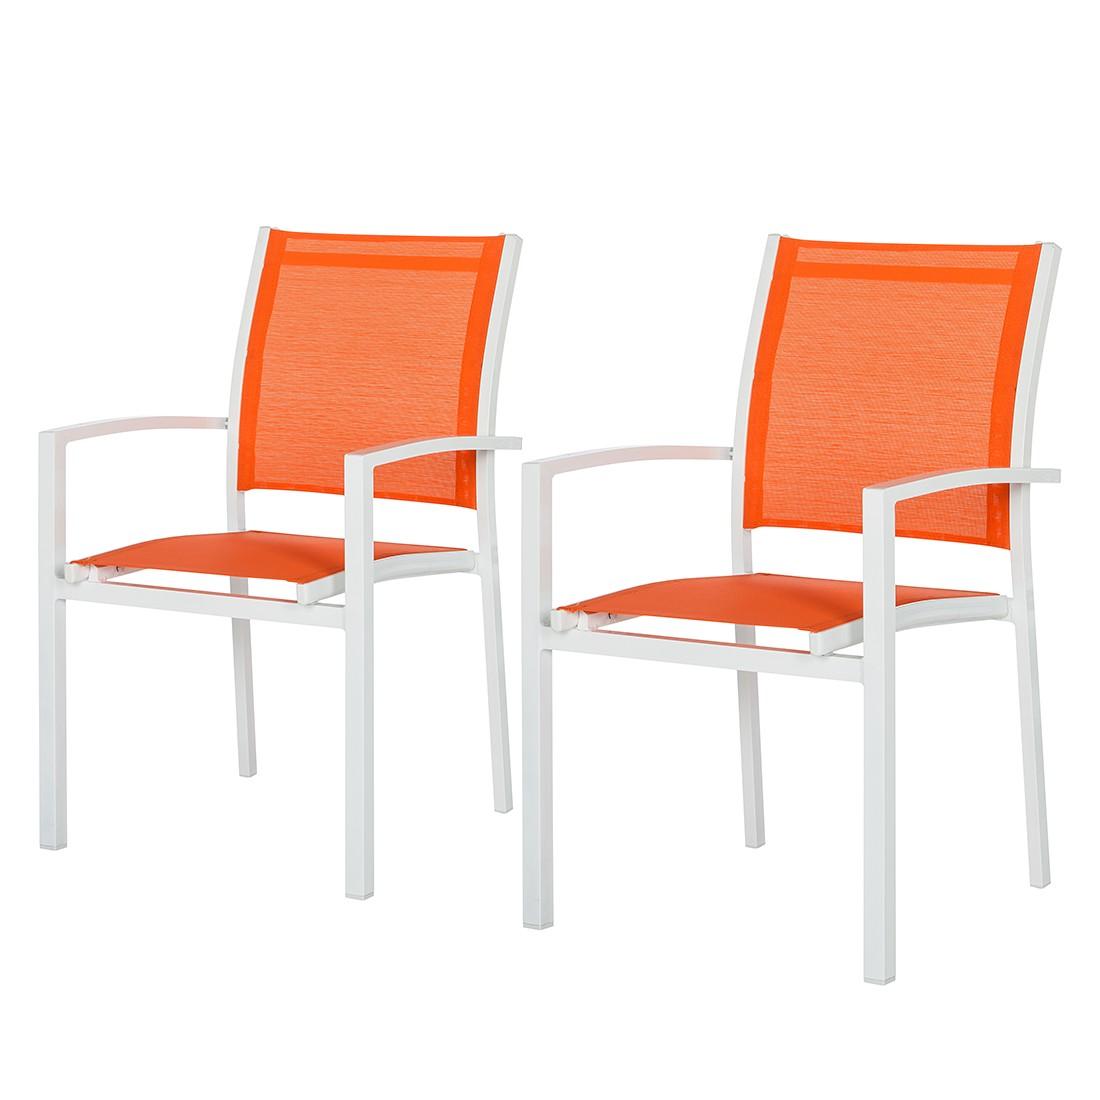 Gartenstuhl Sonny (2er-Set) - Aluminium/Textil Weiß/Orange, Garden Guerilla